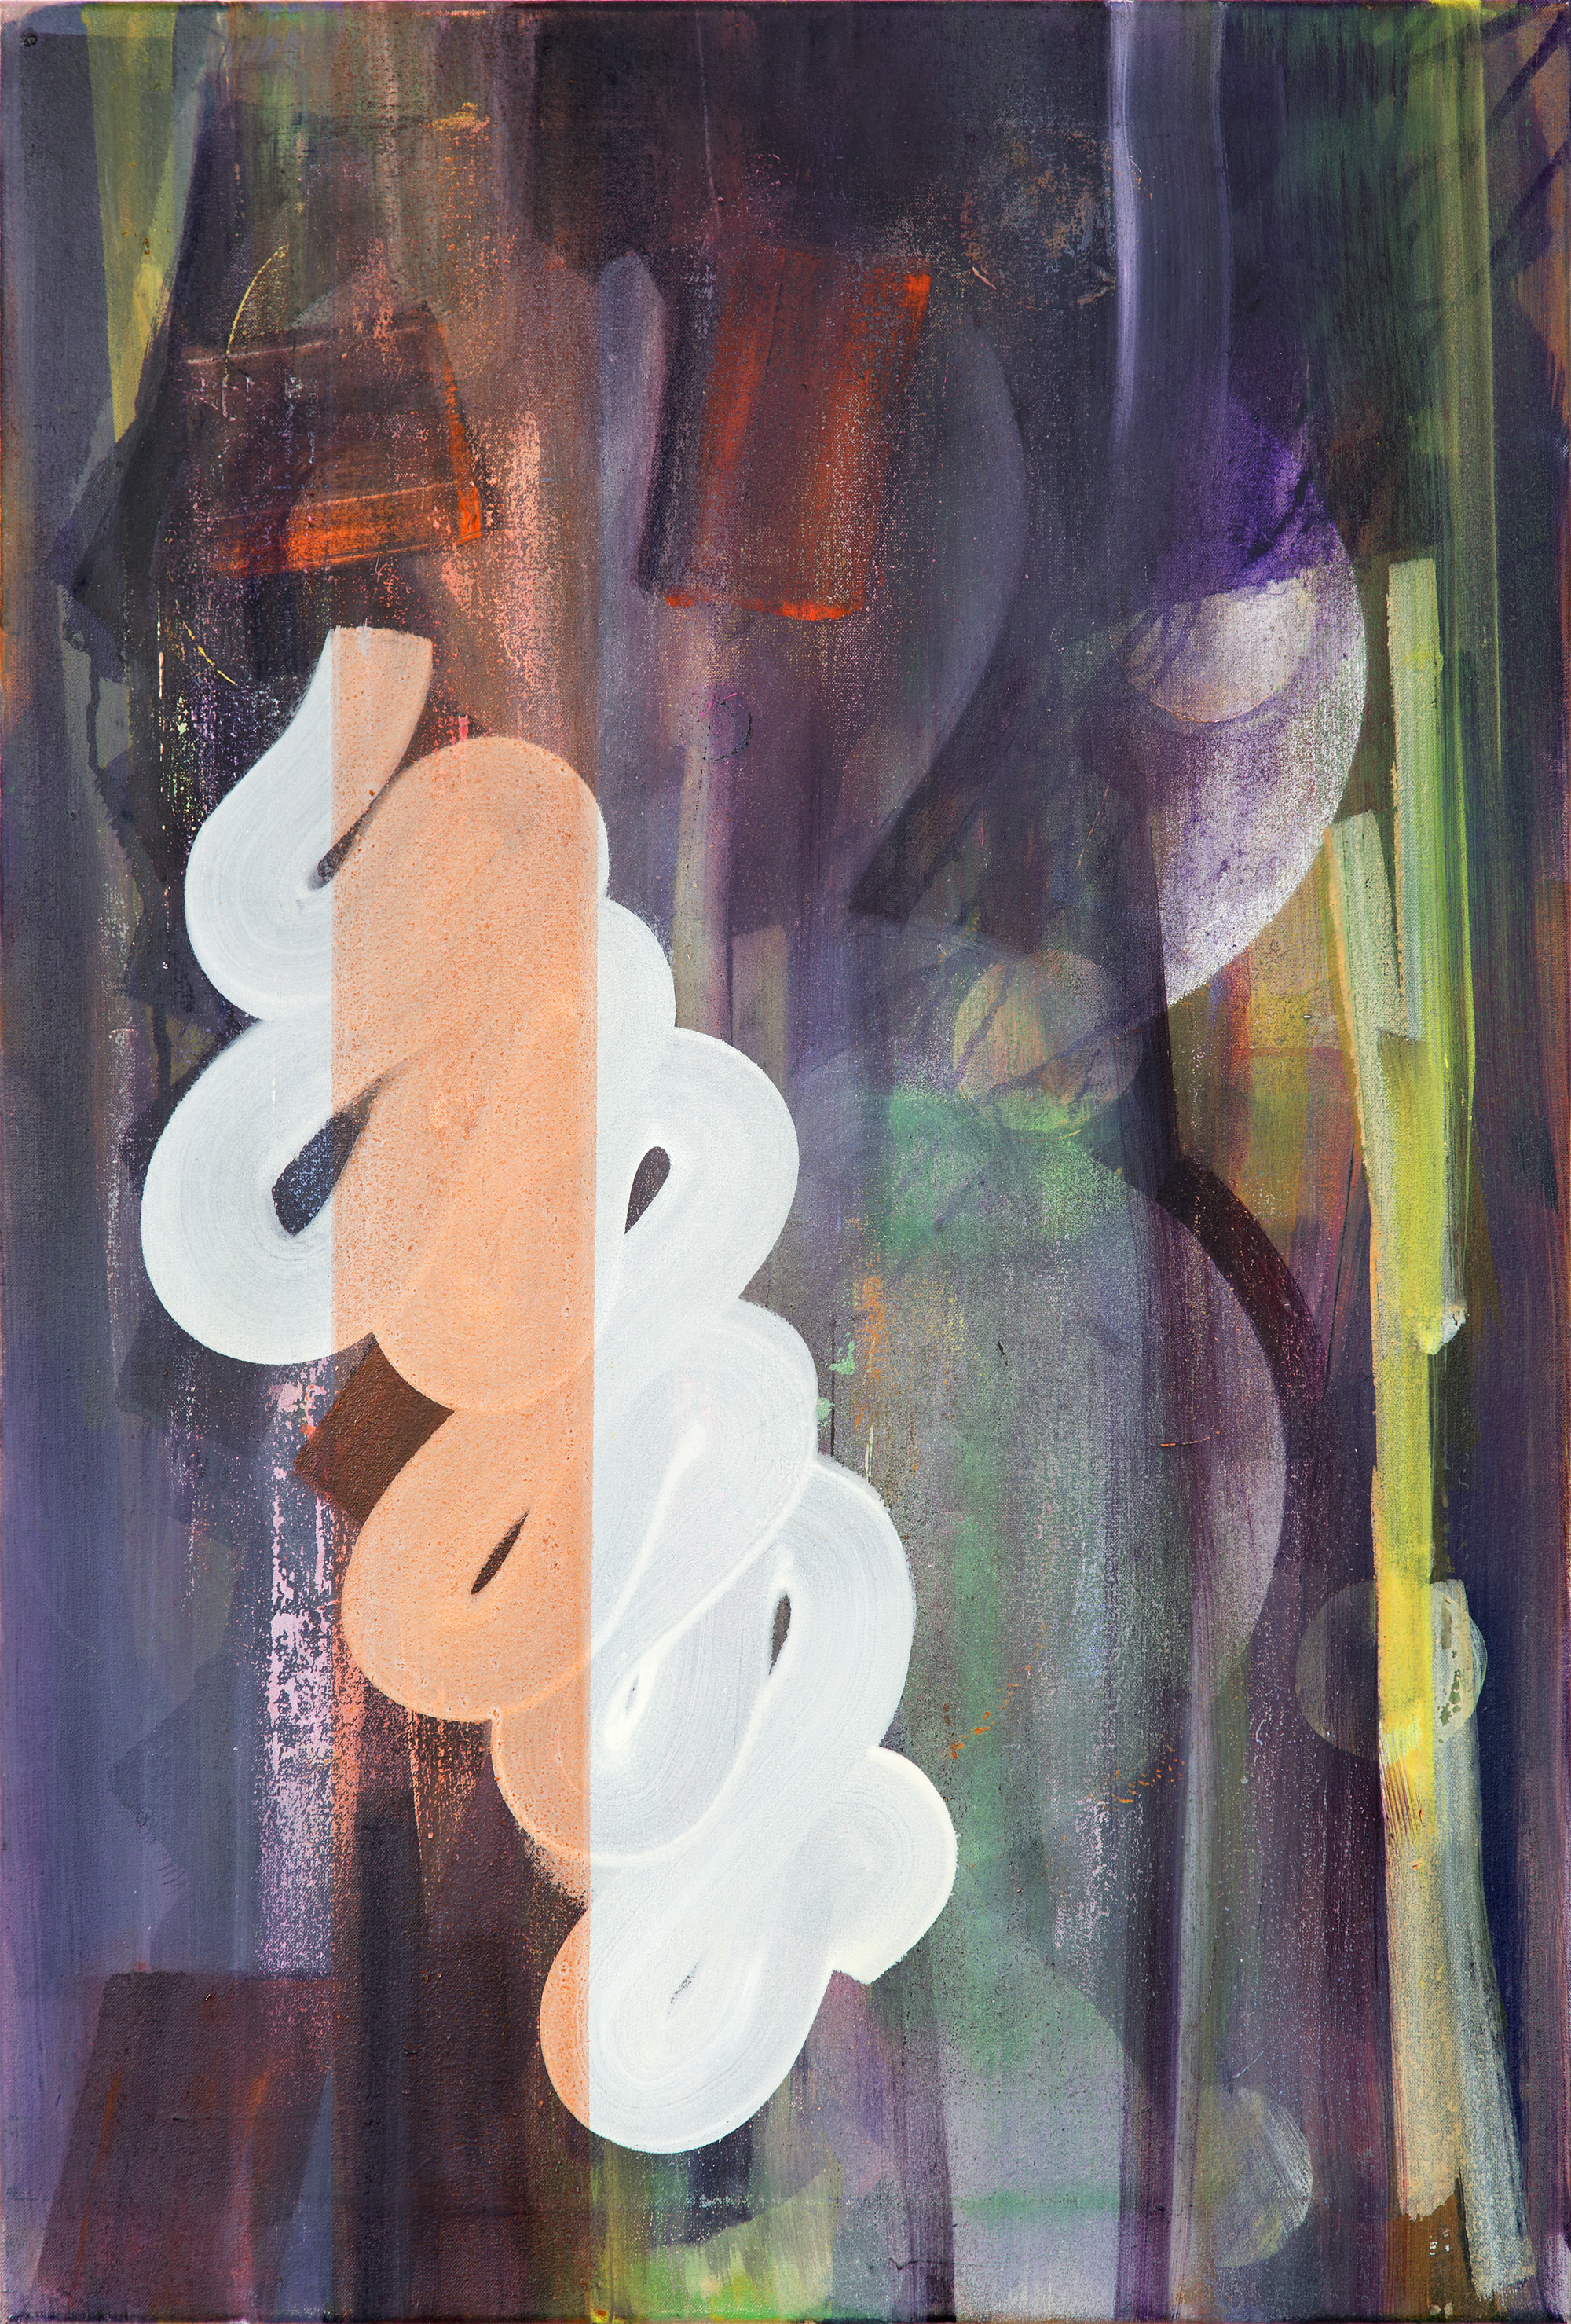 Hard Copy 2, oil on linen, 75cm x 45cm, 2015